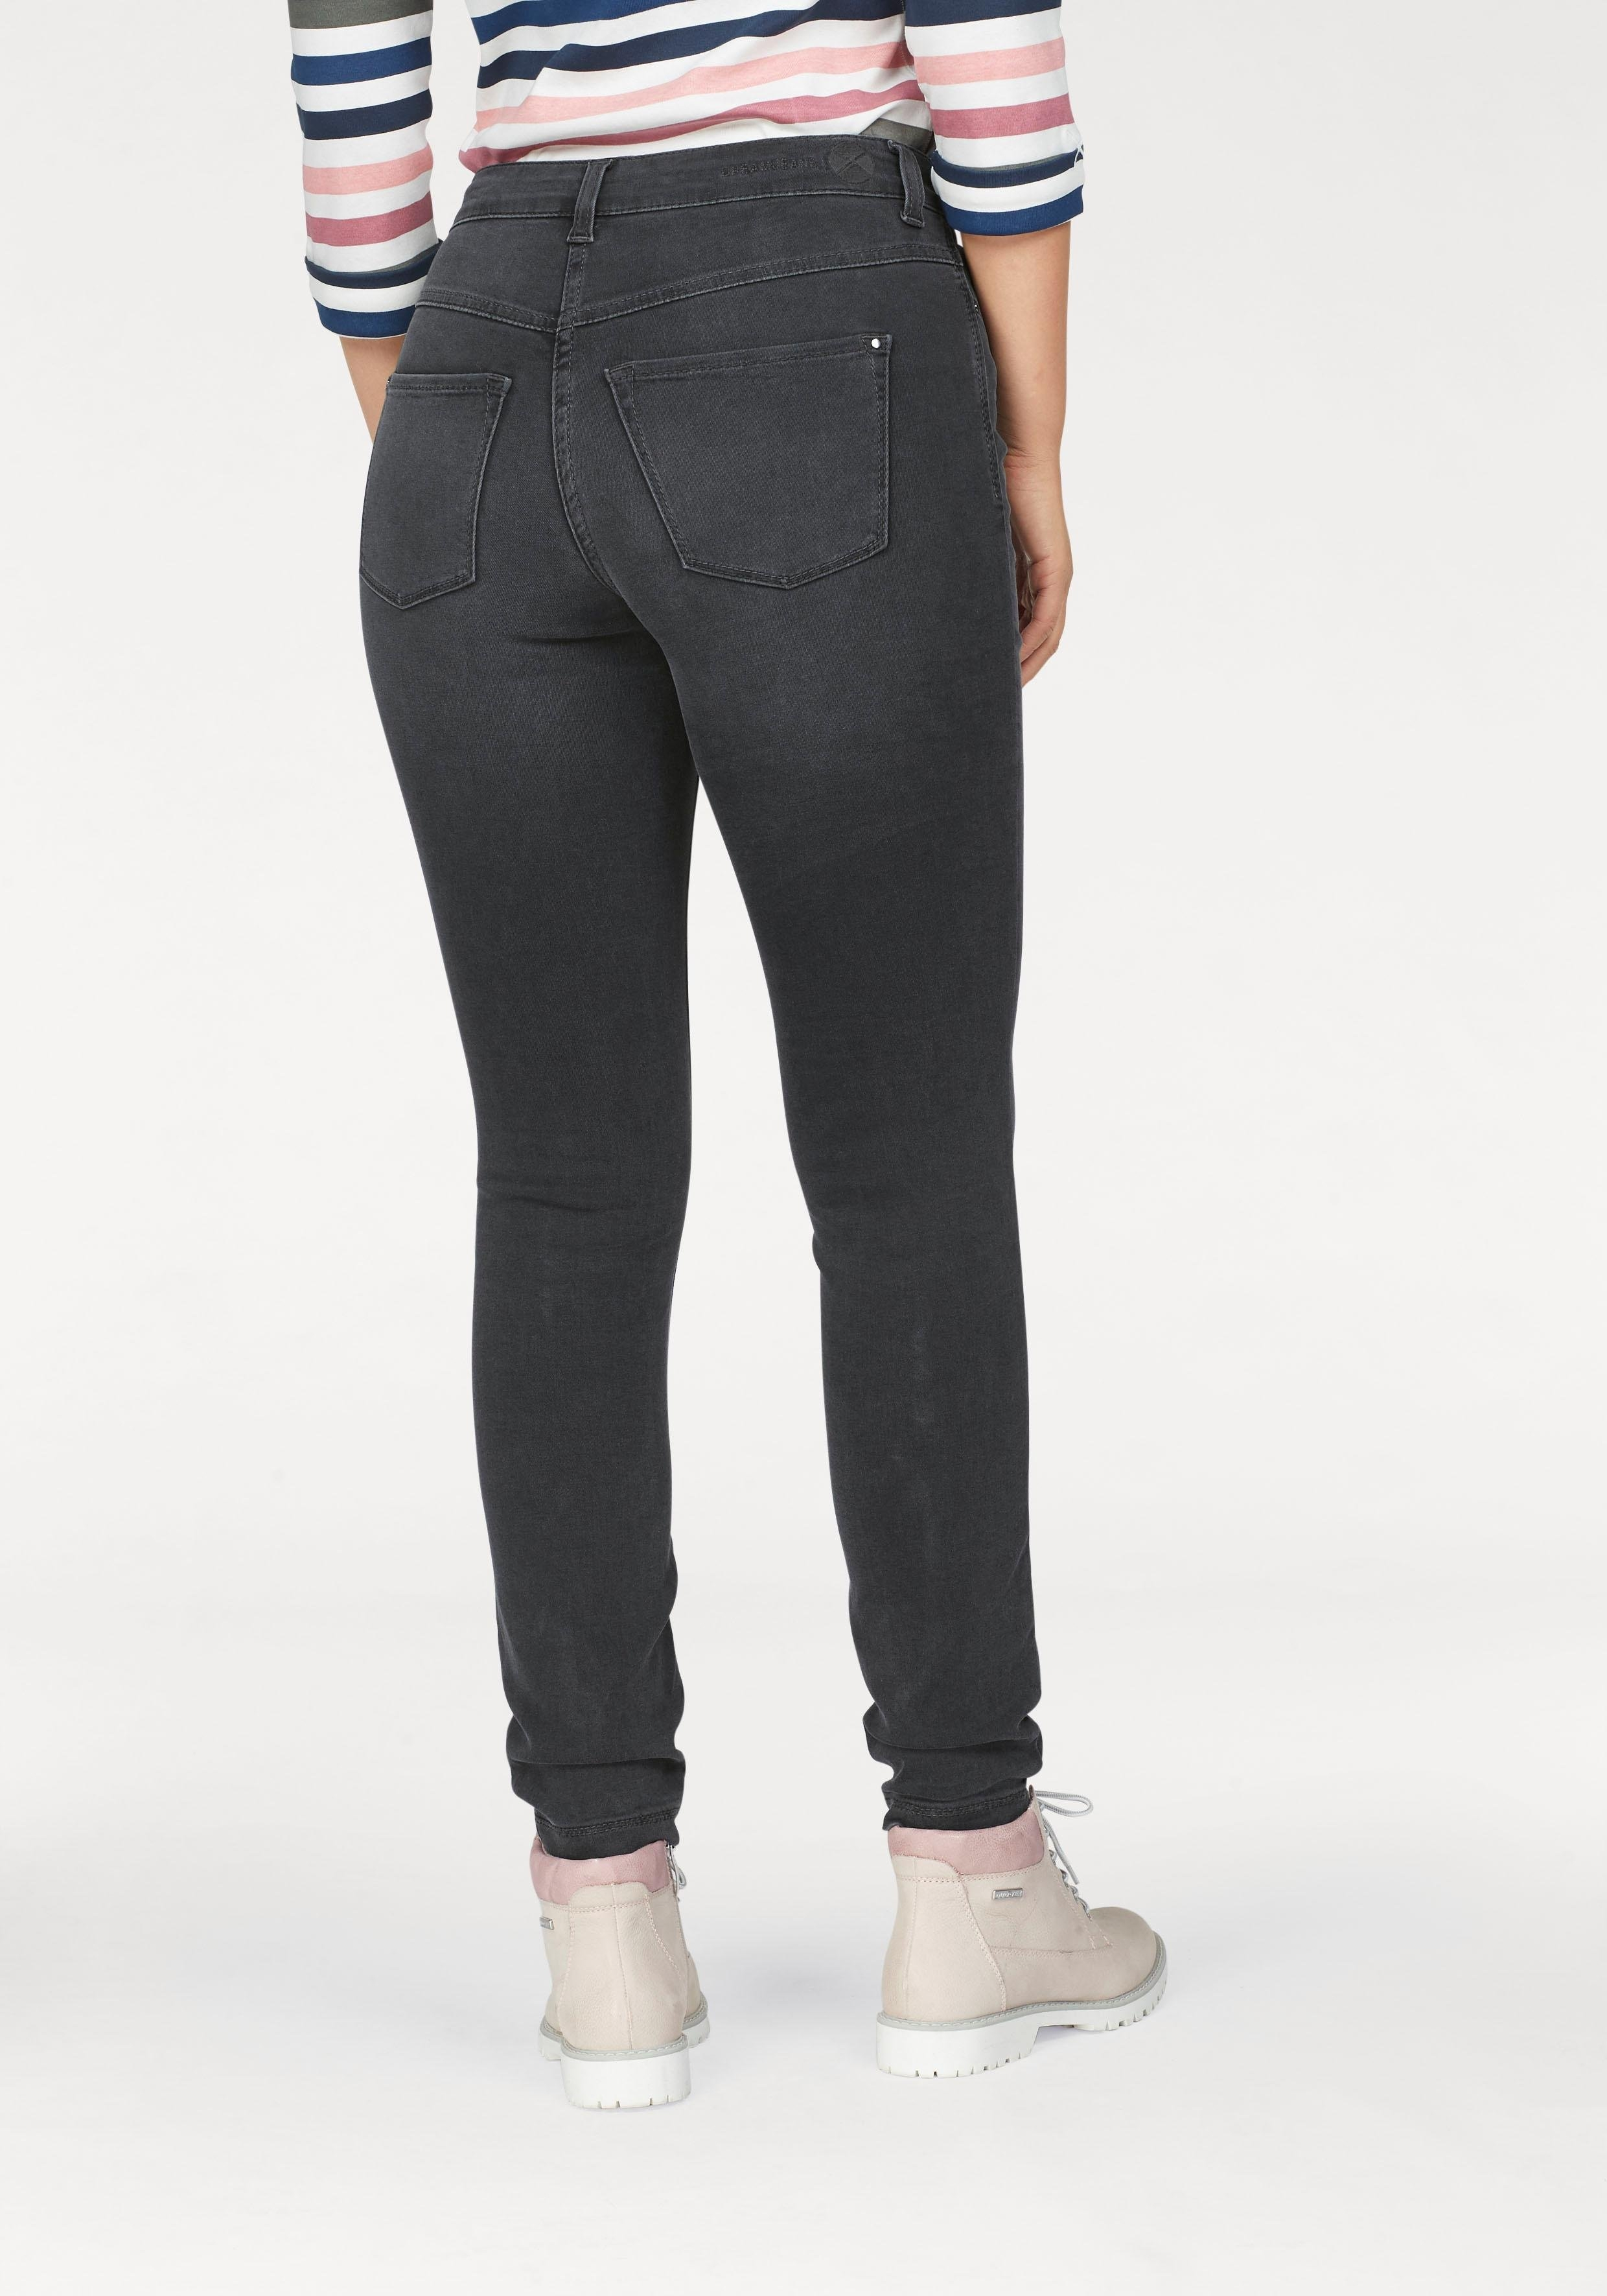 Mac rechte jeans »Dream Skinny« - verschillende betaalmethodes